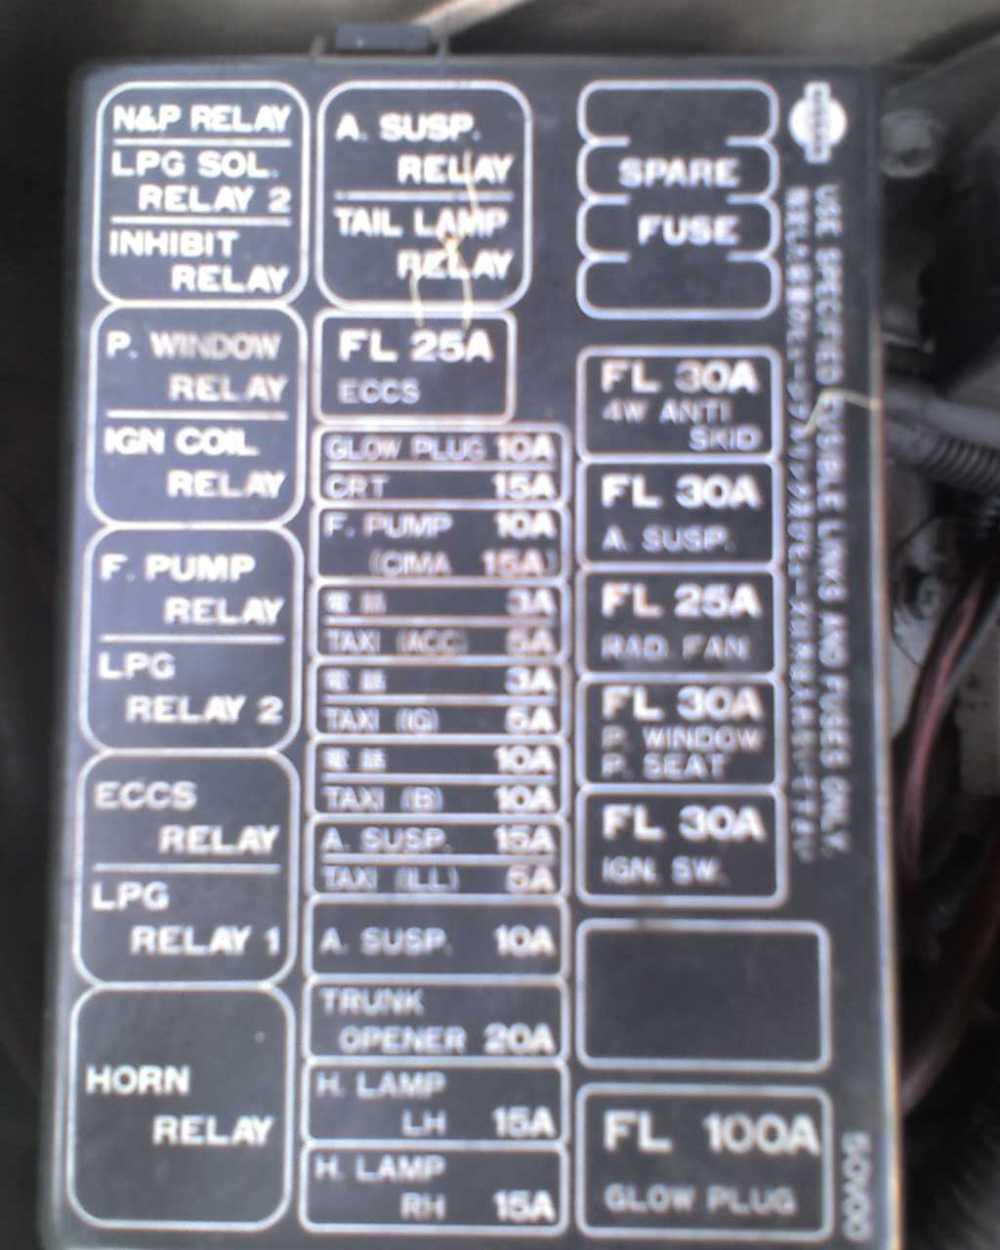 medium resolution of 91 na 300zx fuse box wiring diagram sortnissan 300zx fuse box wiring diagram ebook 91 na